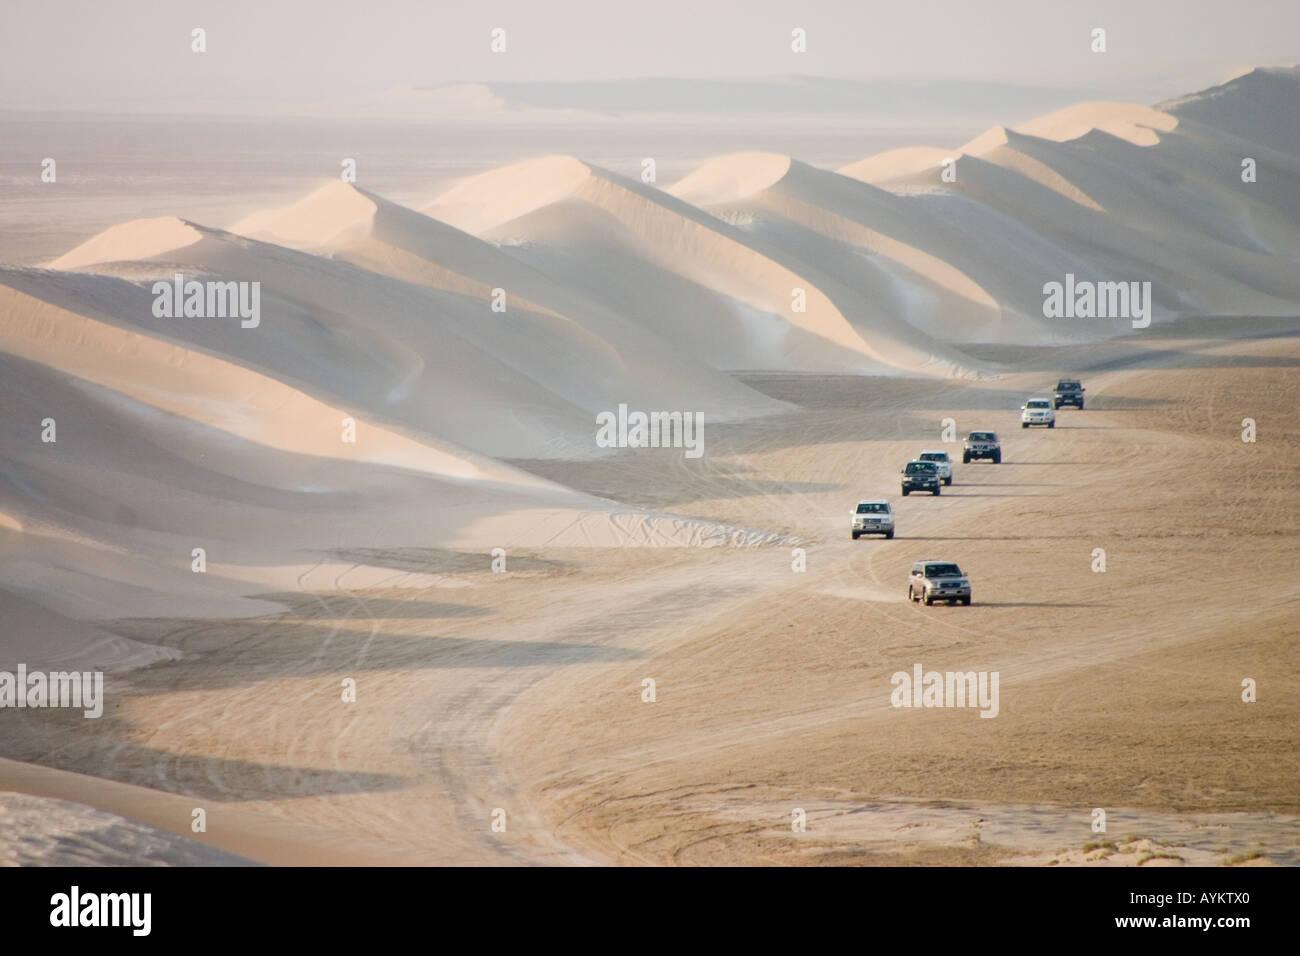 Sand dunes near the inland sea qatar - Stock Image